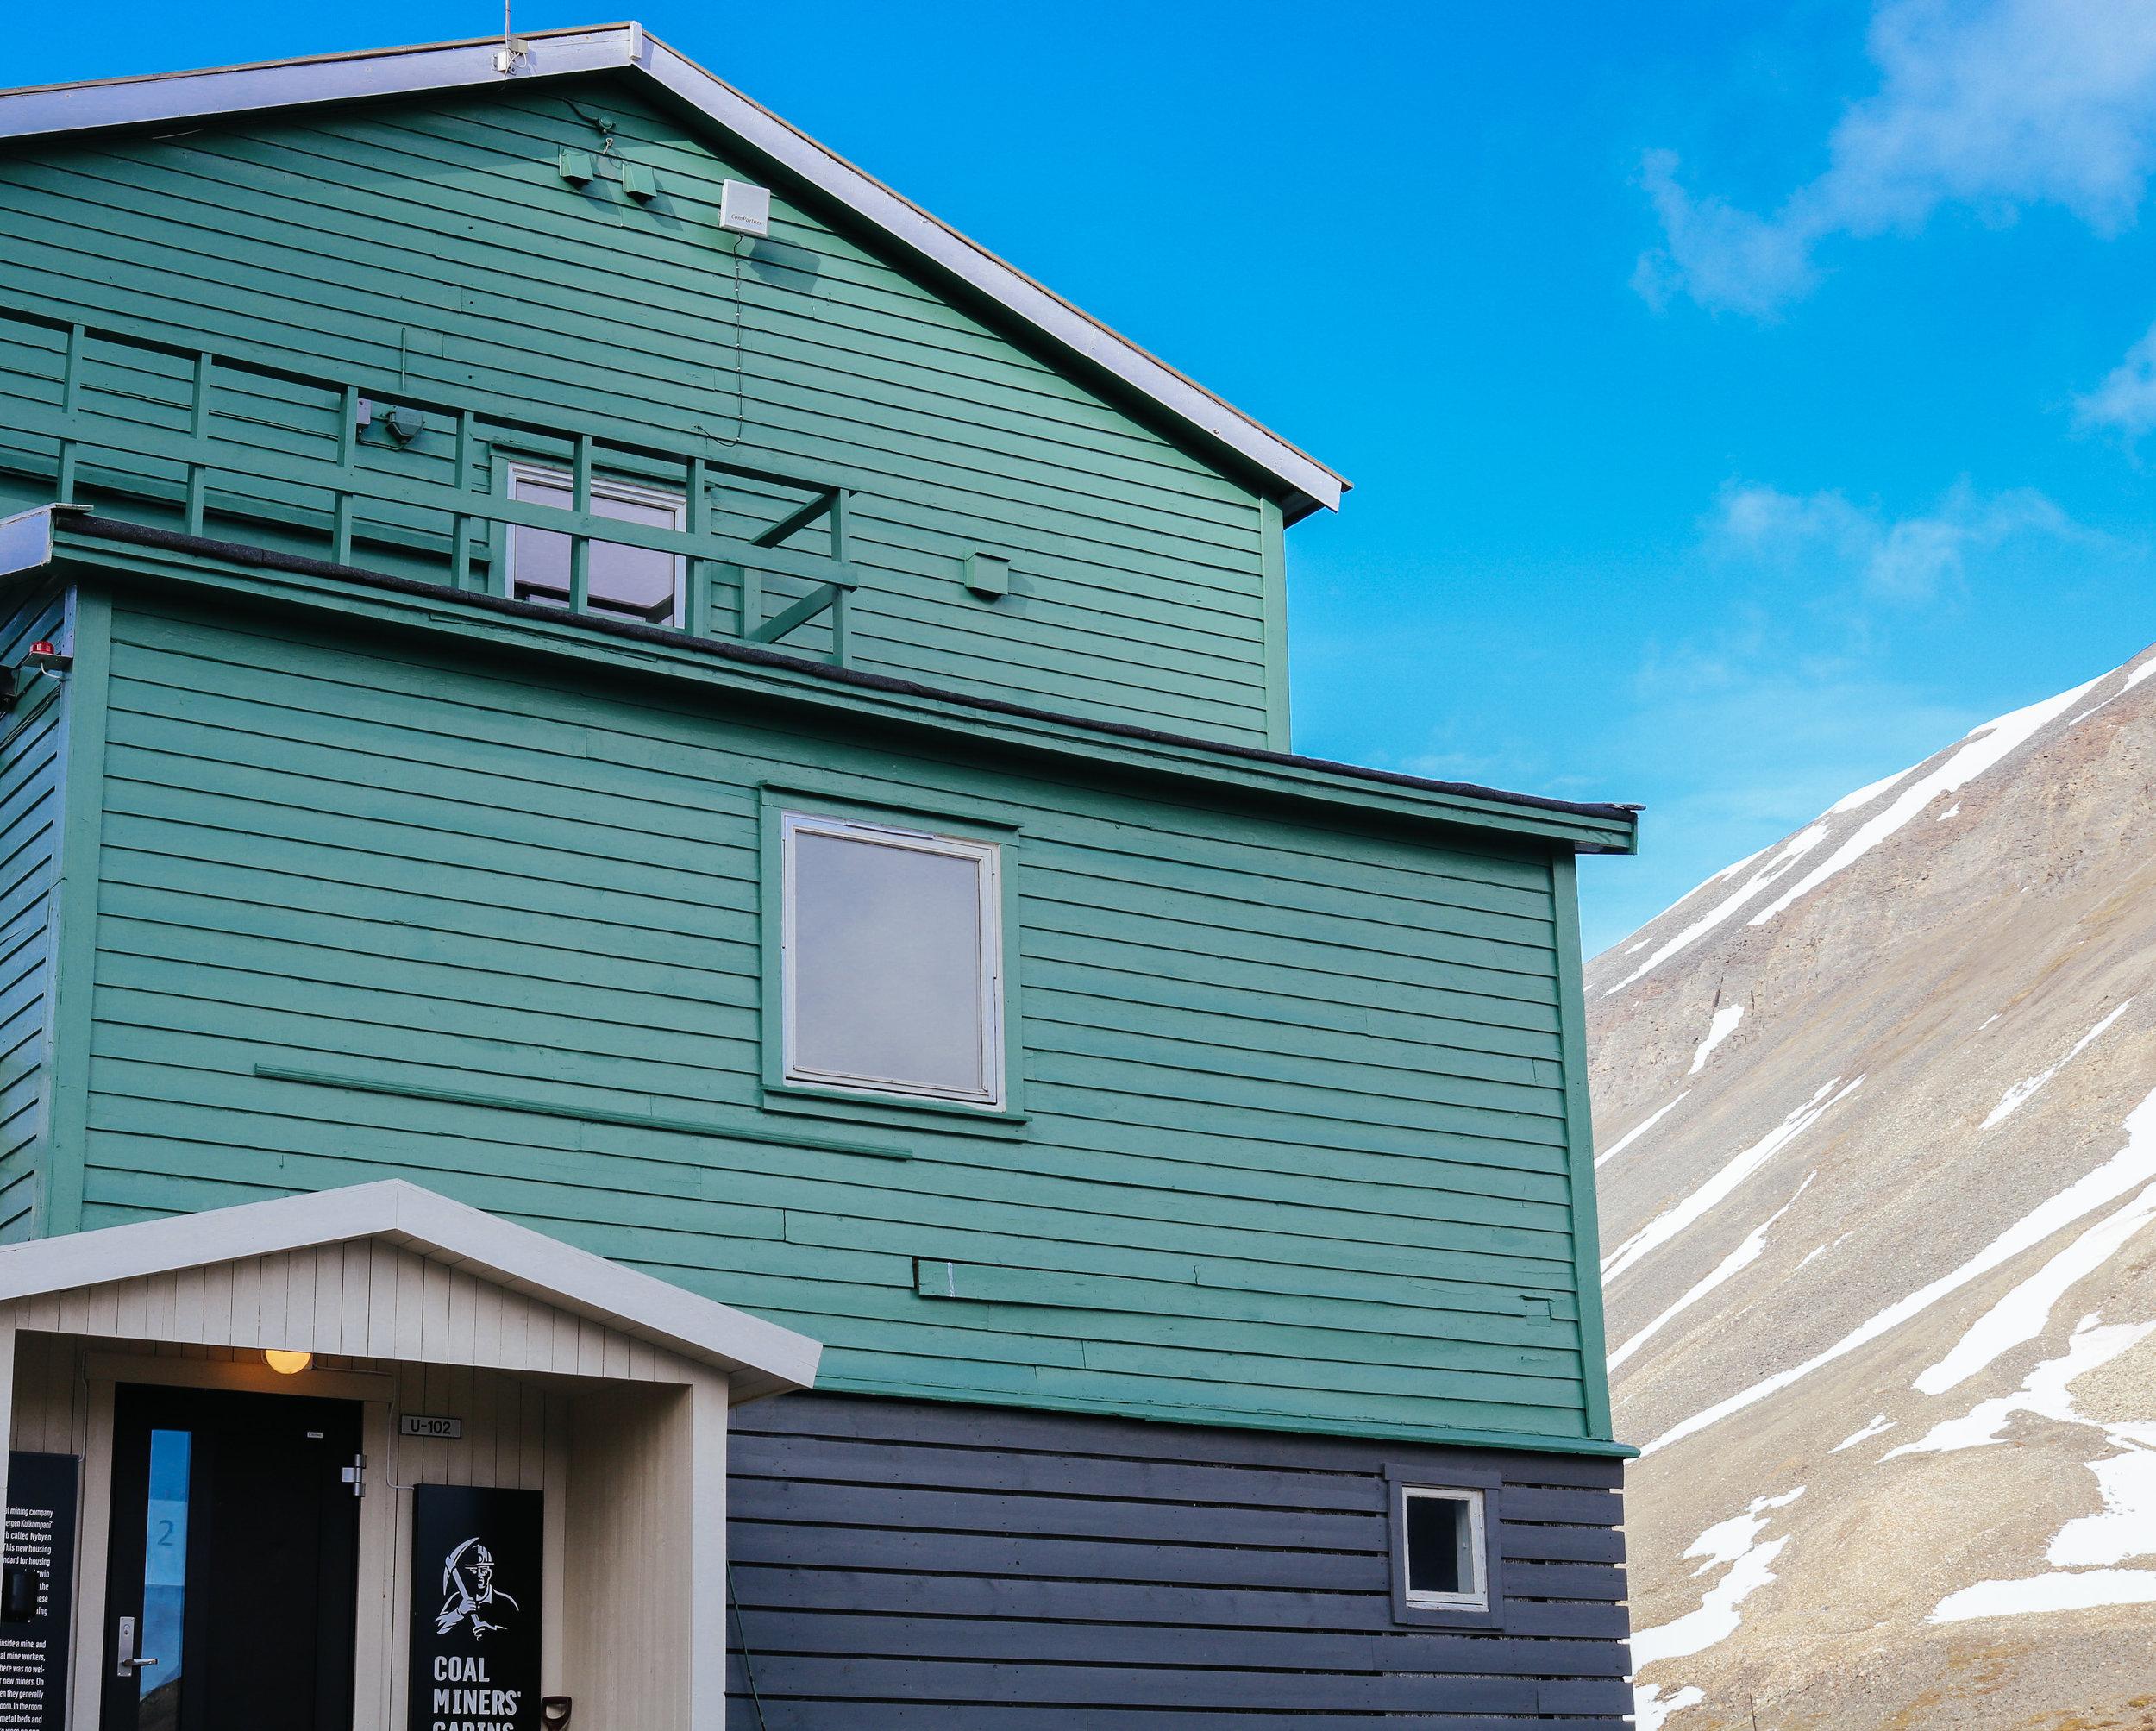 coal miners' cabins svalbard